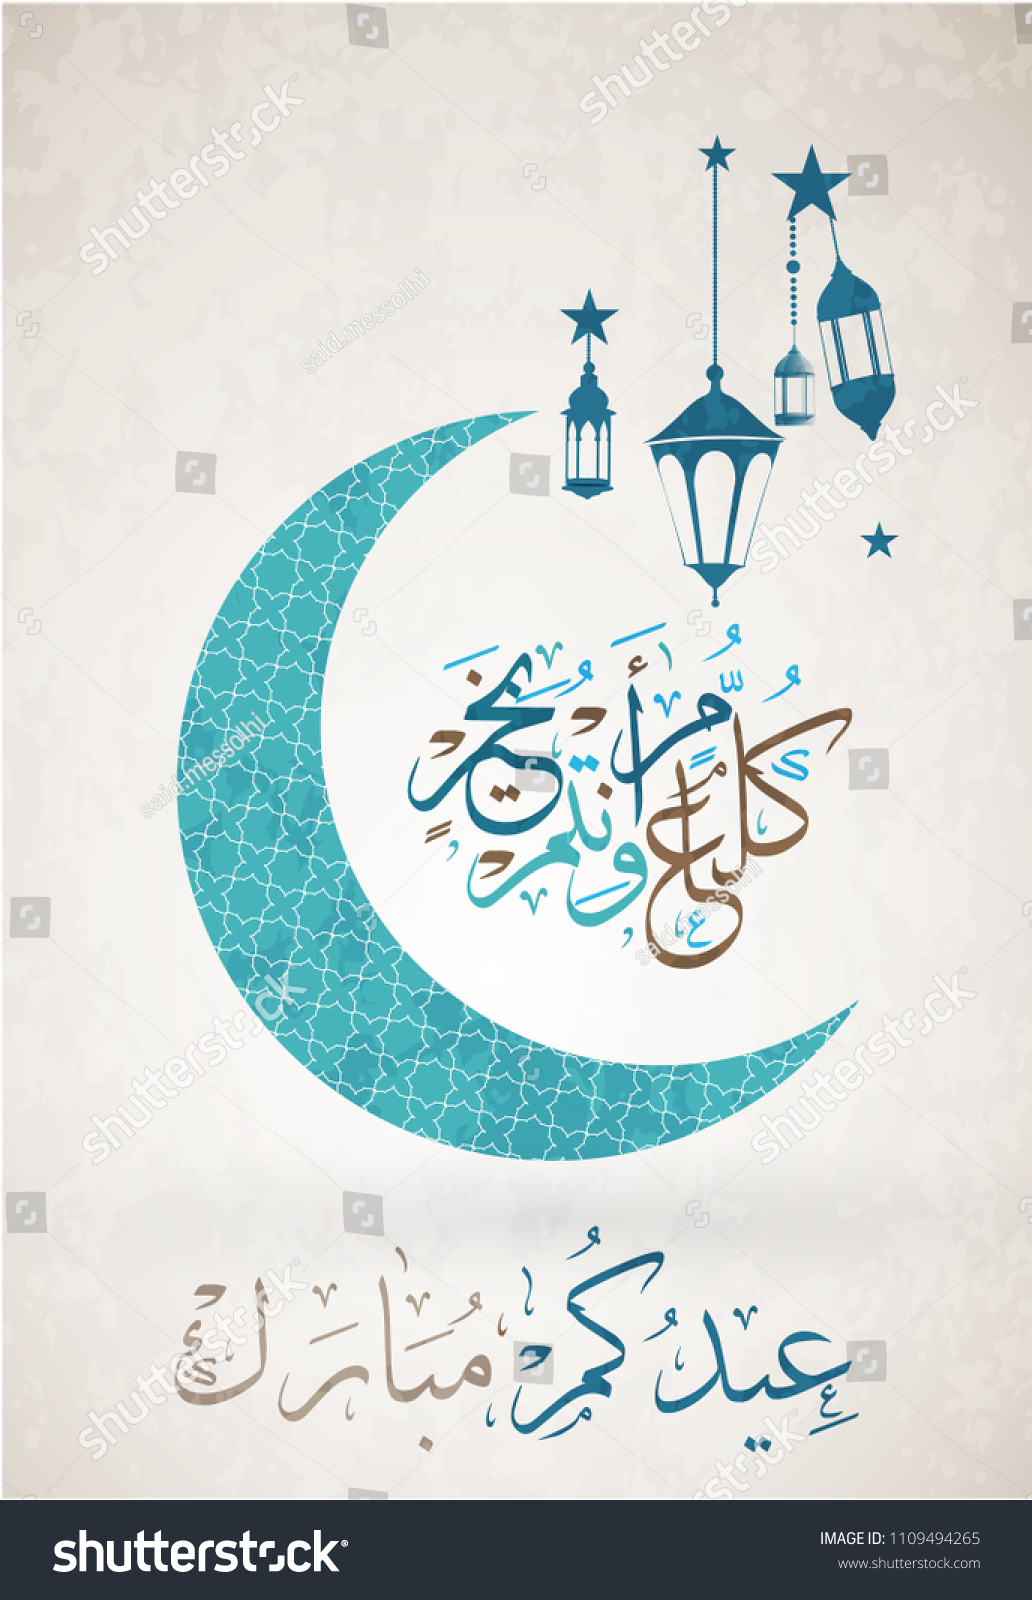 Eid mubarak islamic greeting arabic calligraphy stock vector eid mubarak islamic greeting with arabic calligraphy translation blessed and happy eid every year m4hsunfo